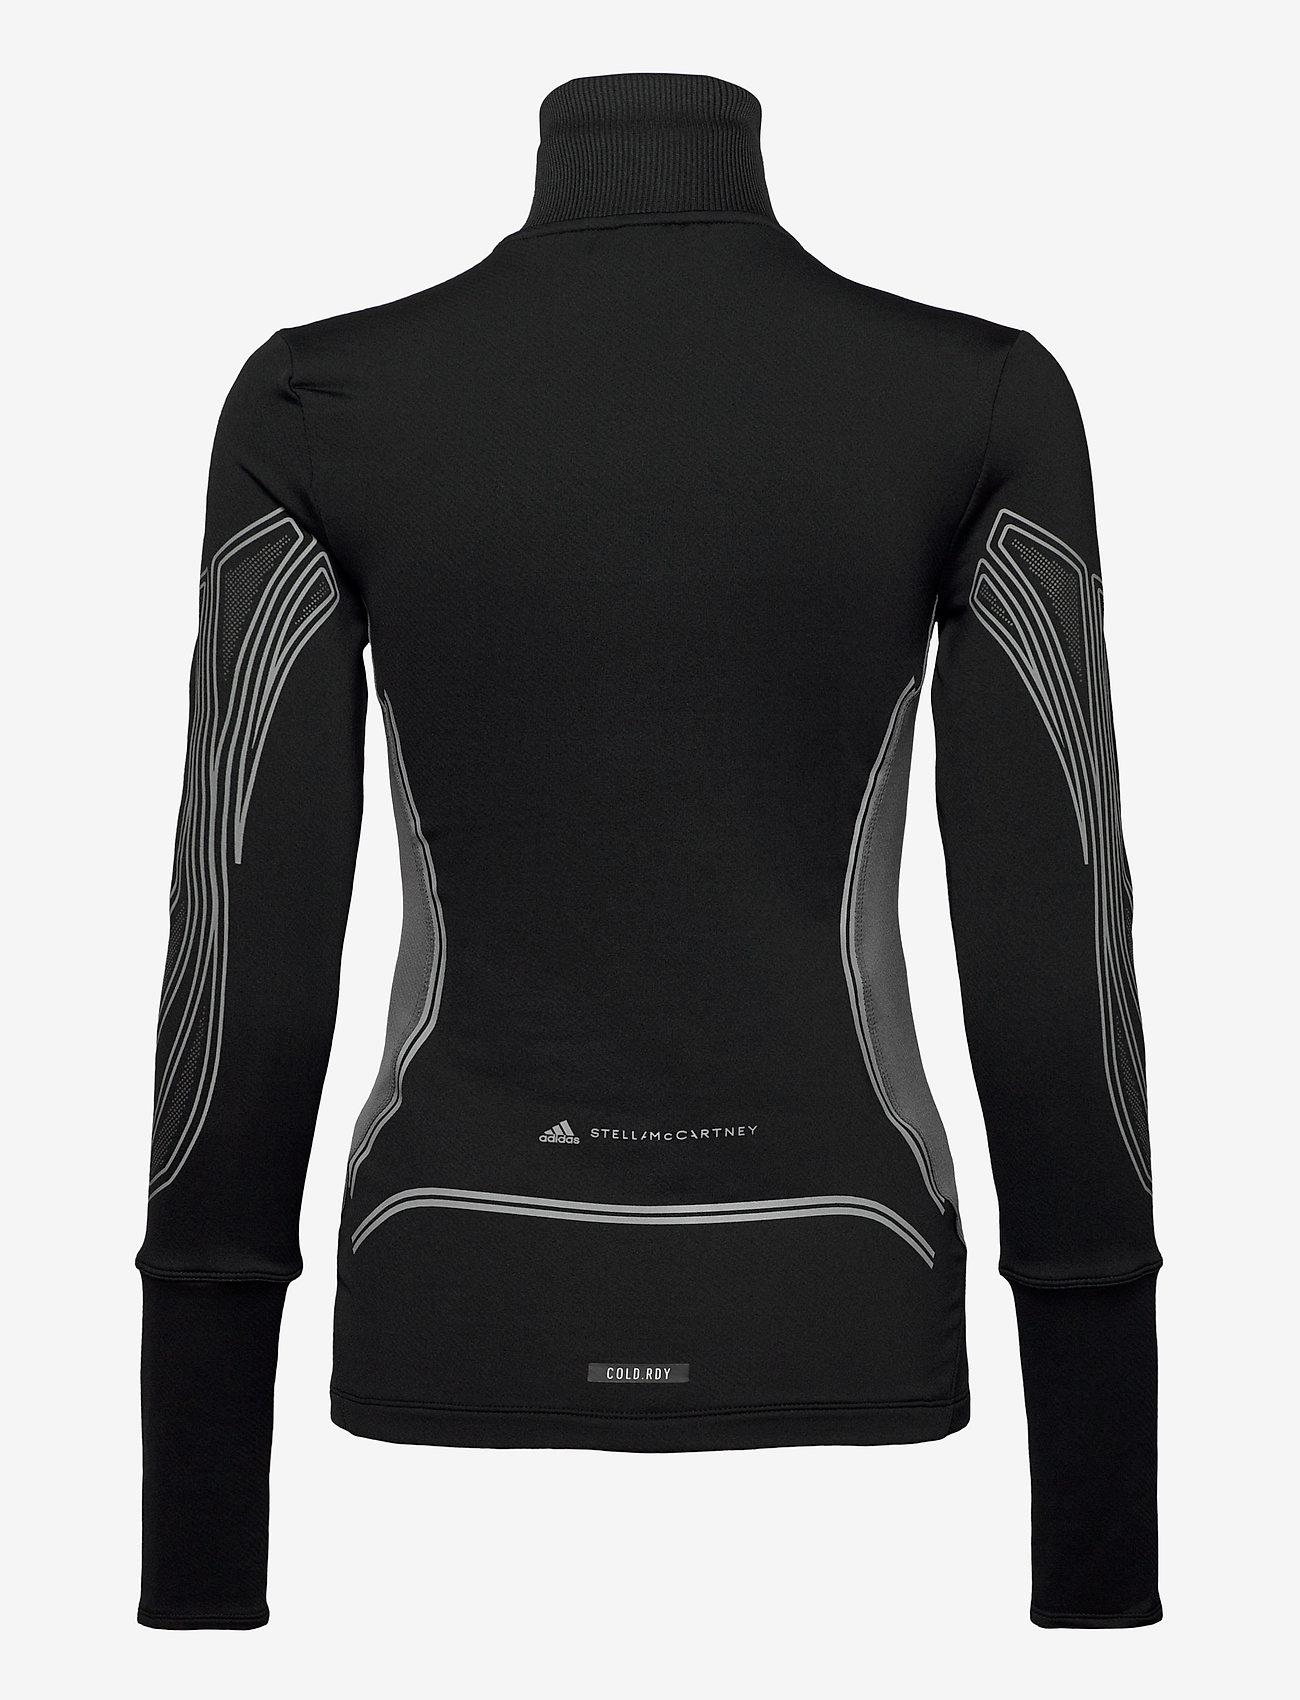 adidas by Stella McCartney - TRUEPACE C.R ML - training jackets - black/granit - 1